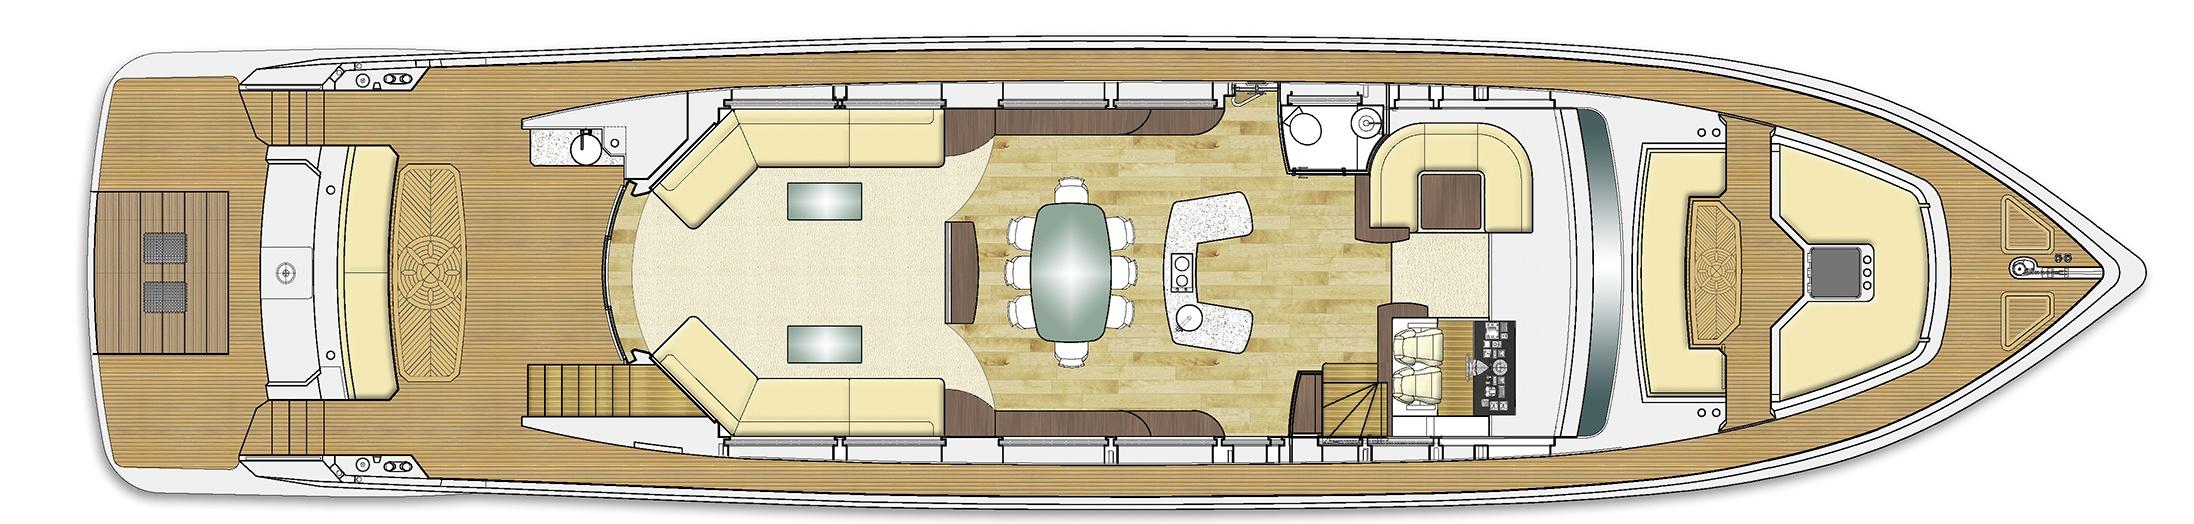 majesty-90-main-deck.jpg